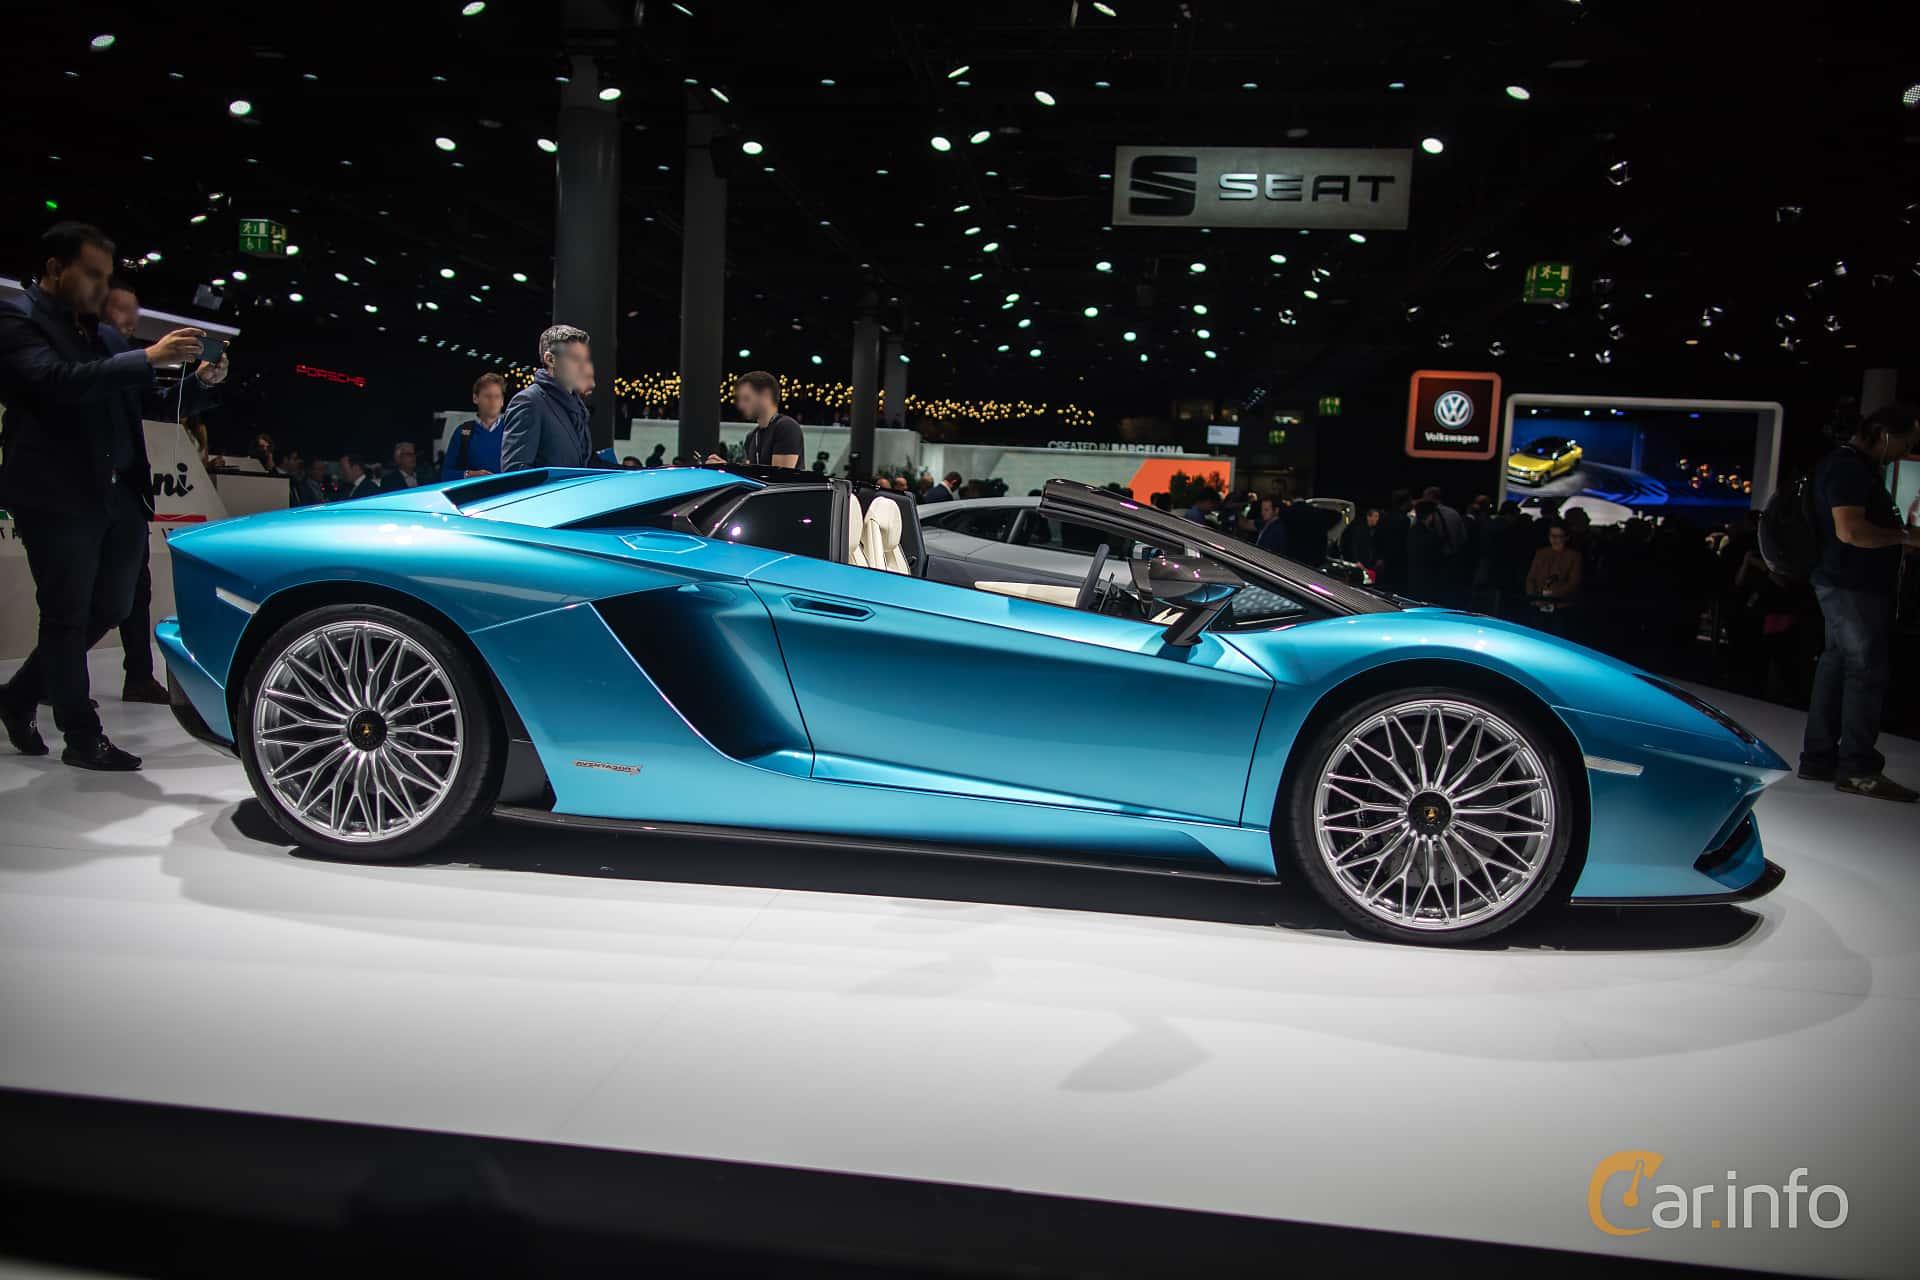 4 Images Of Lamborghini Aventador Lp 740 4 S Roadster 6 5 V12 Isr